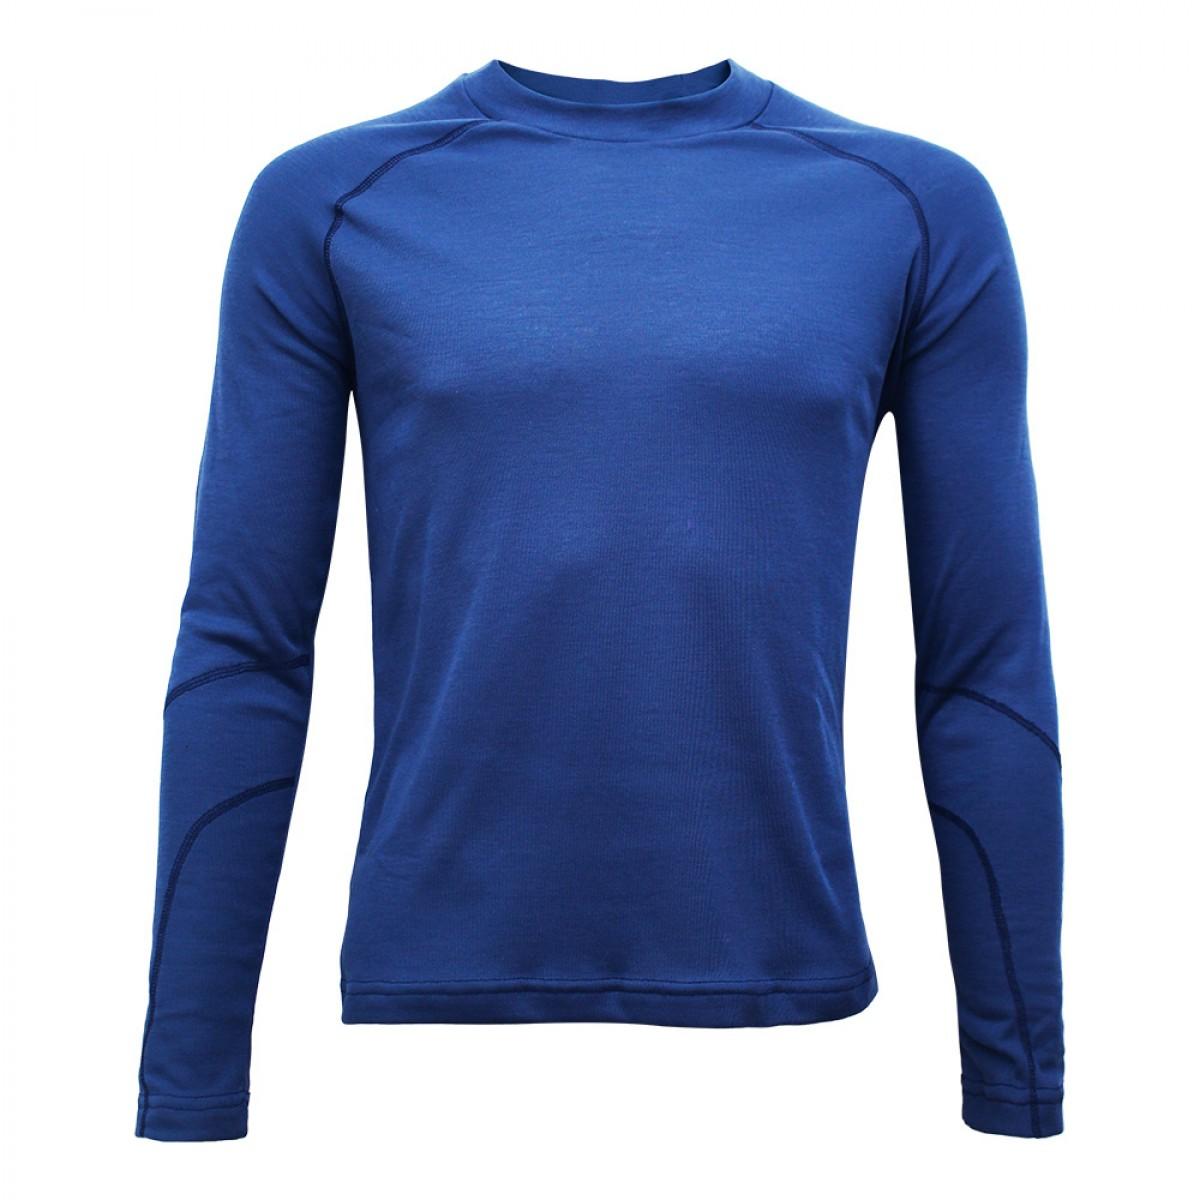 men-single-fleece-thermal-vest-kftv05920-5a